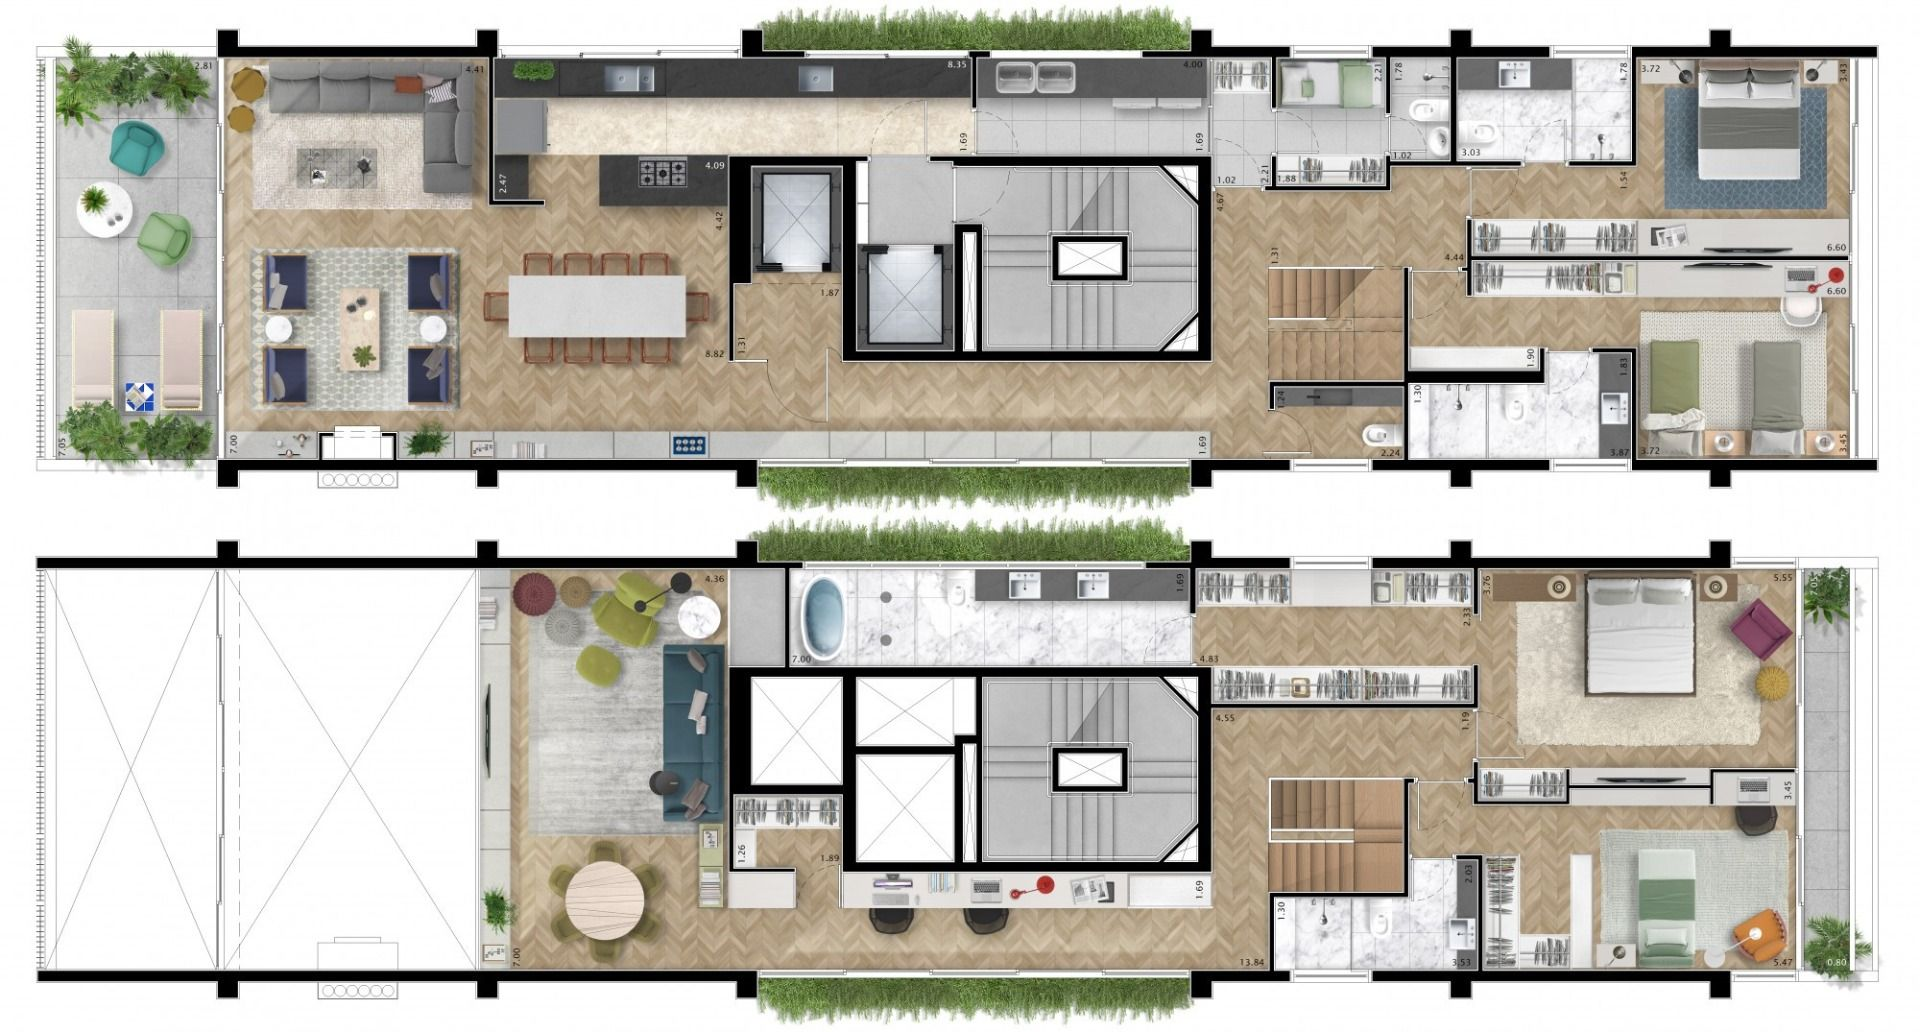 Planta do Itacolomi 445. floorplan